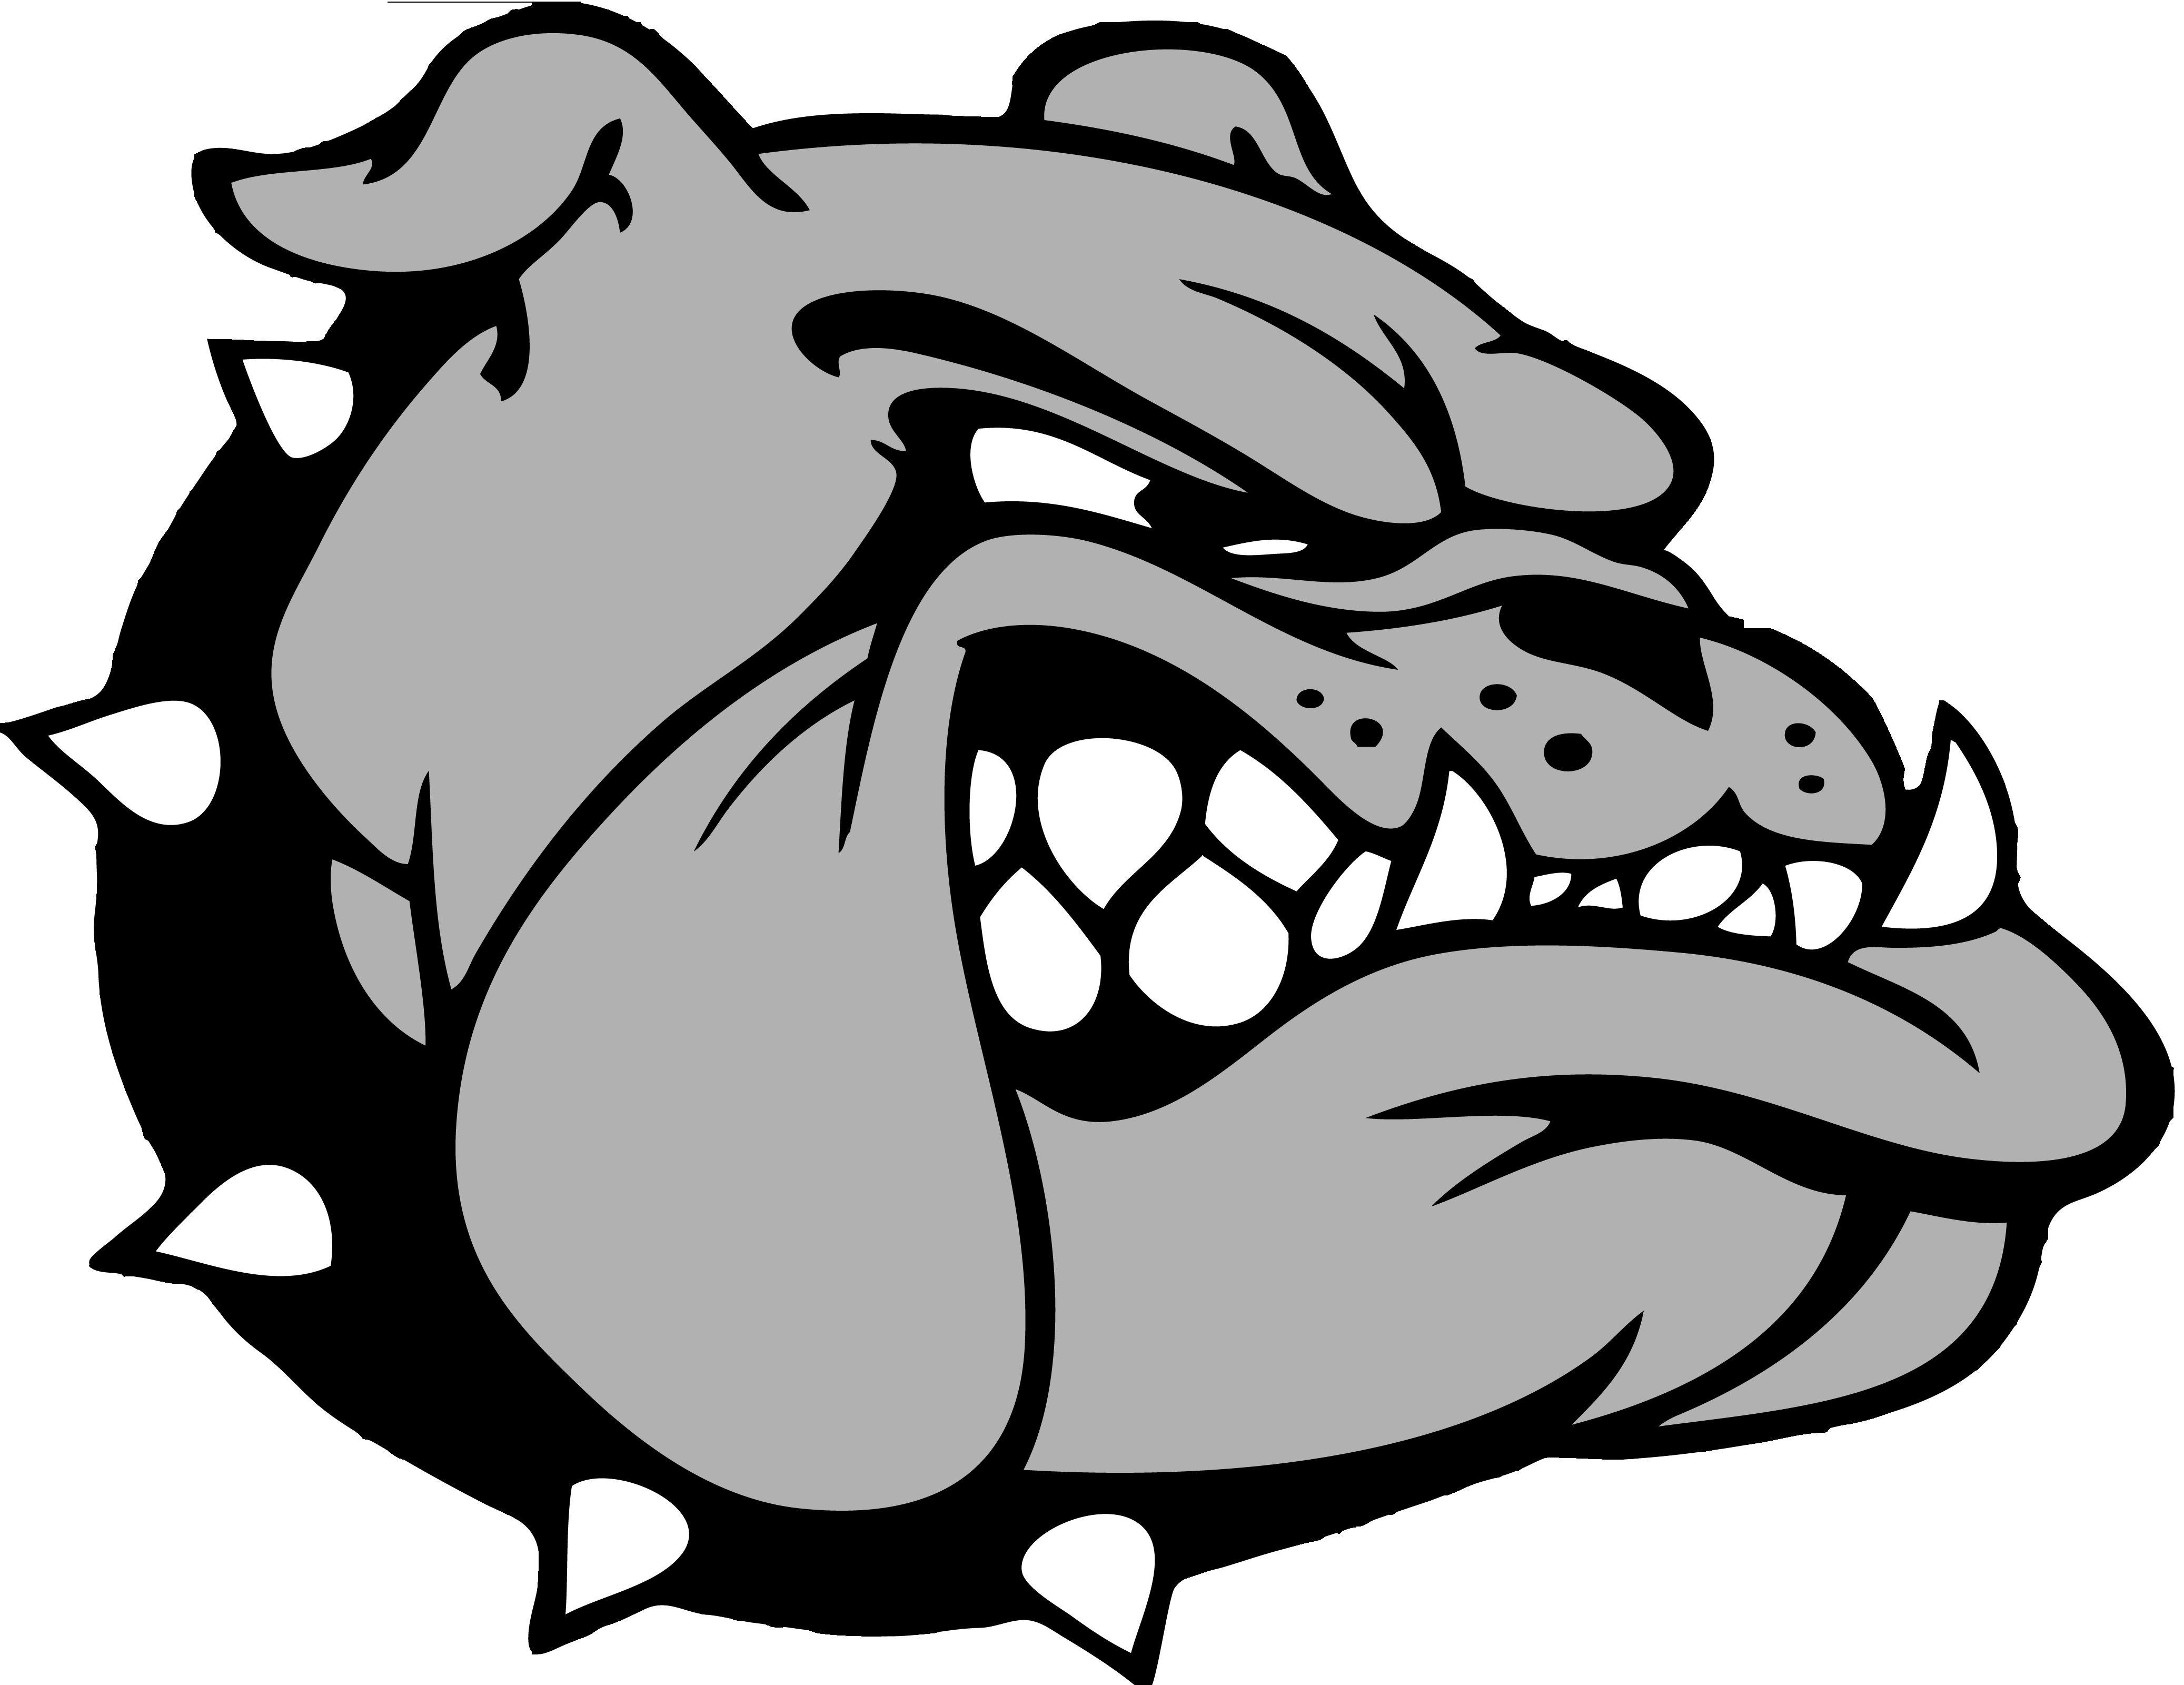 School Mascot Bulldog Clip Art 148px X 3 200px Http Mascot